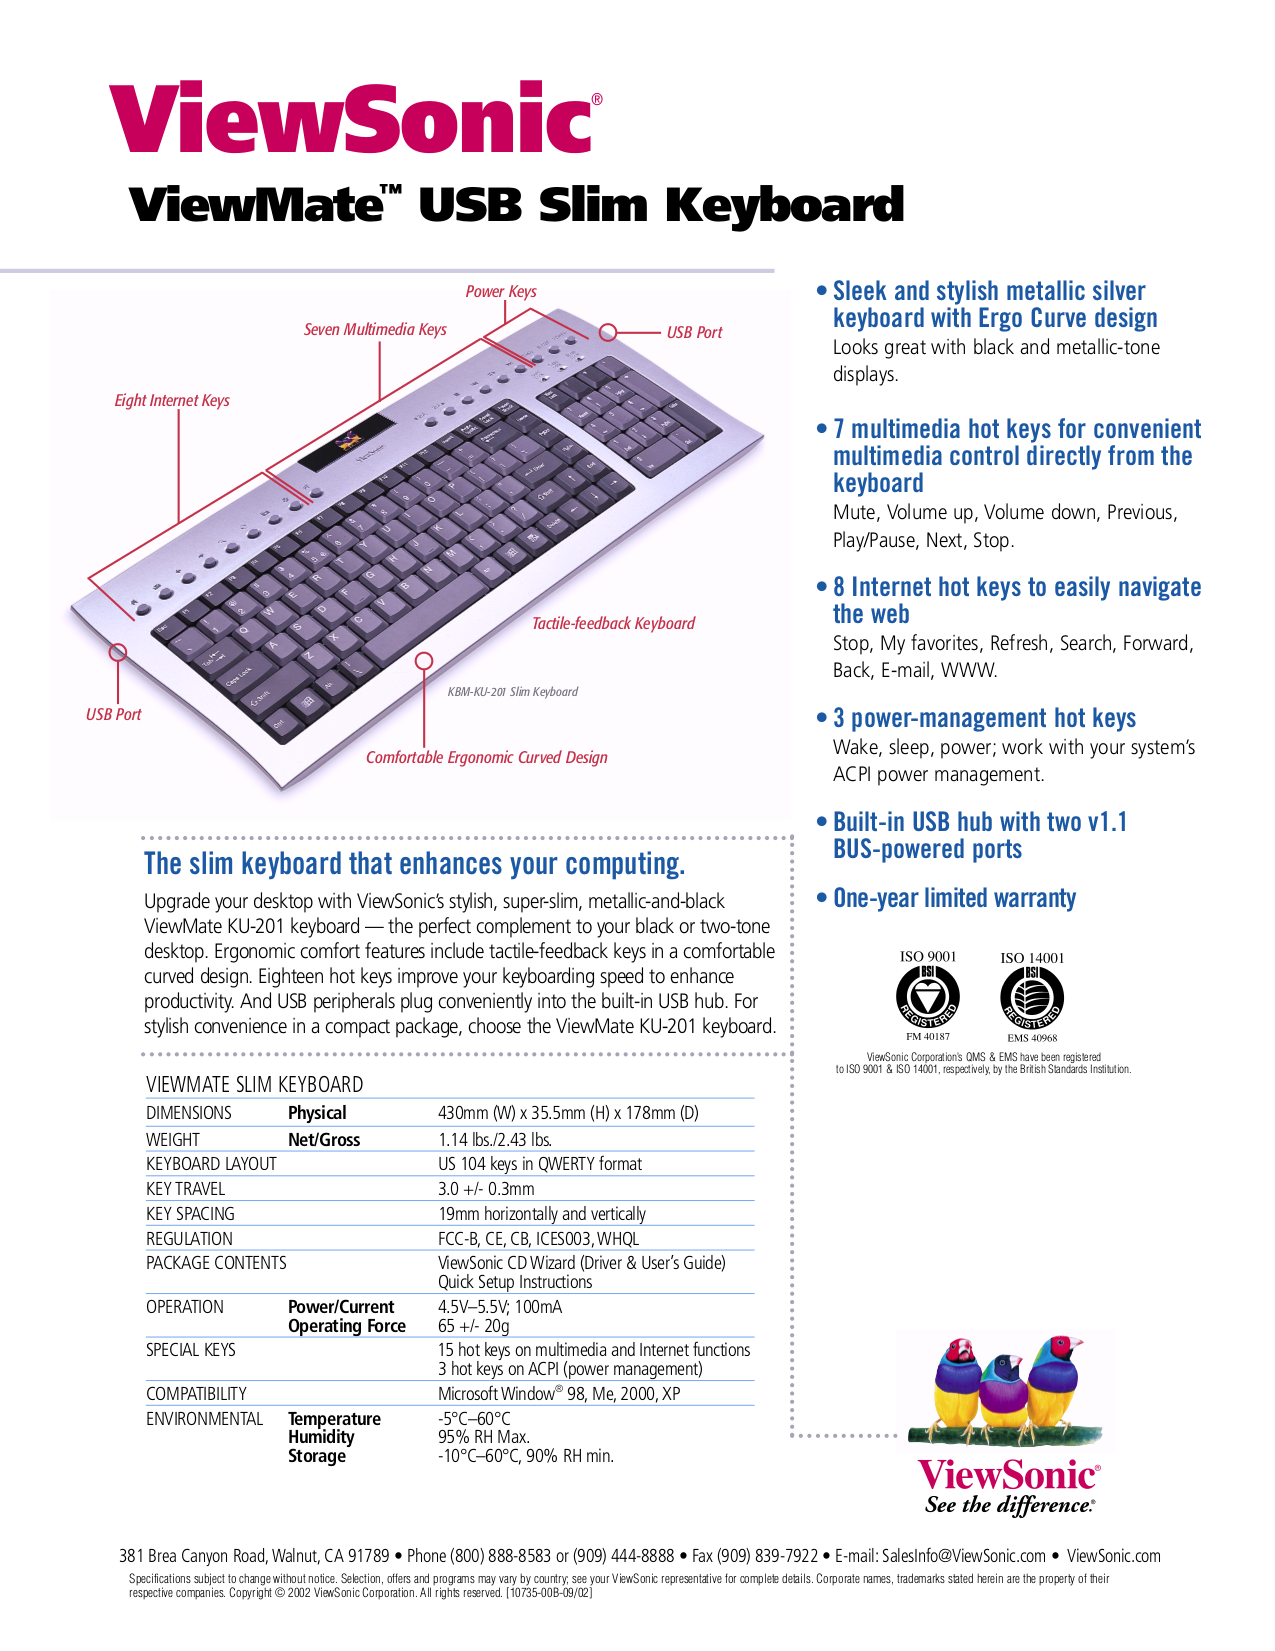 pdf for Viewsonic Other ViewMate KU201 Keyboard manual